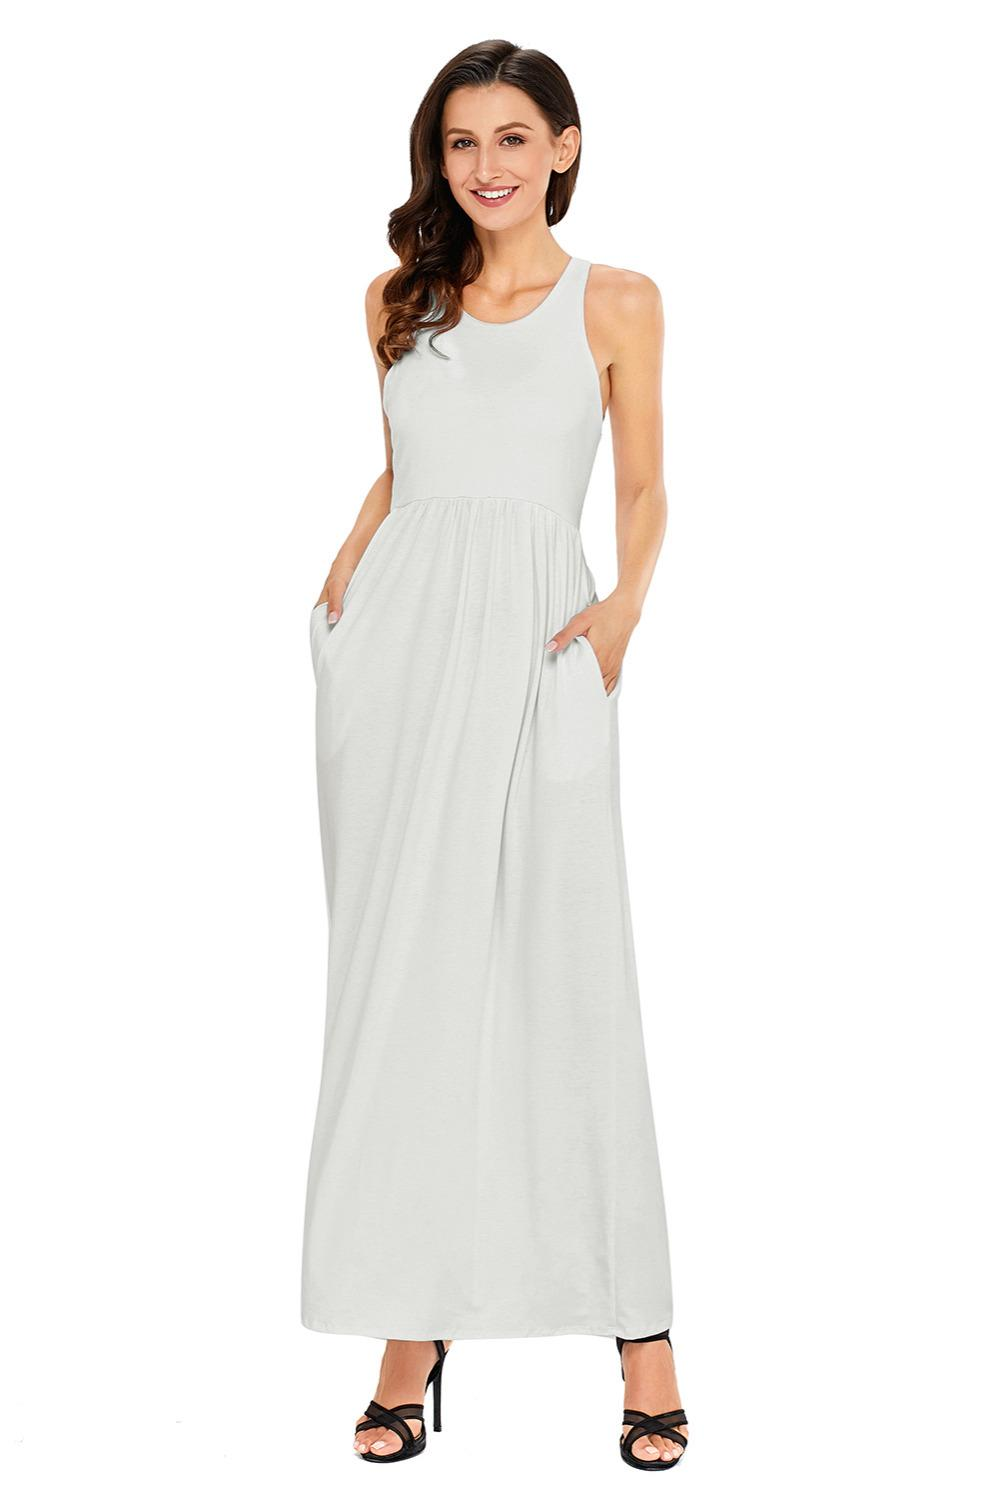 fa1e6b31f5 Sexy Lady Womens Hobo Spring Beach Casual Wear Long Sundress Plus Size  White Racerback Maxi Dress With Pocket S M L Xl Xxl 61647 White Dress Womens  Short ...